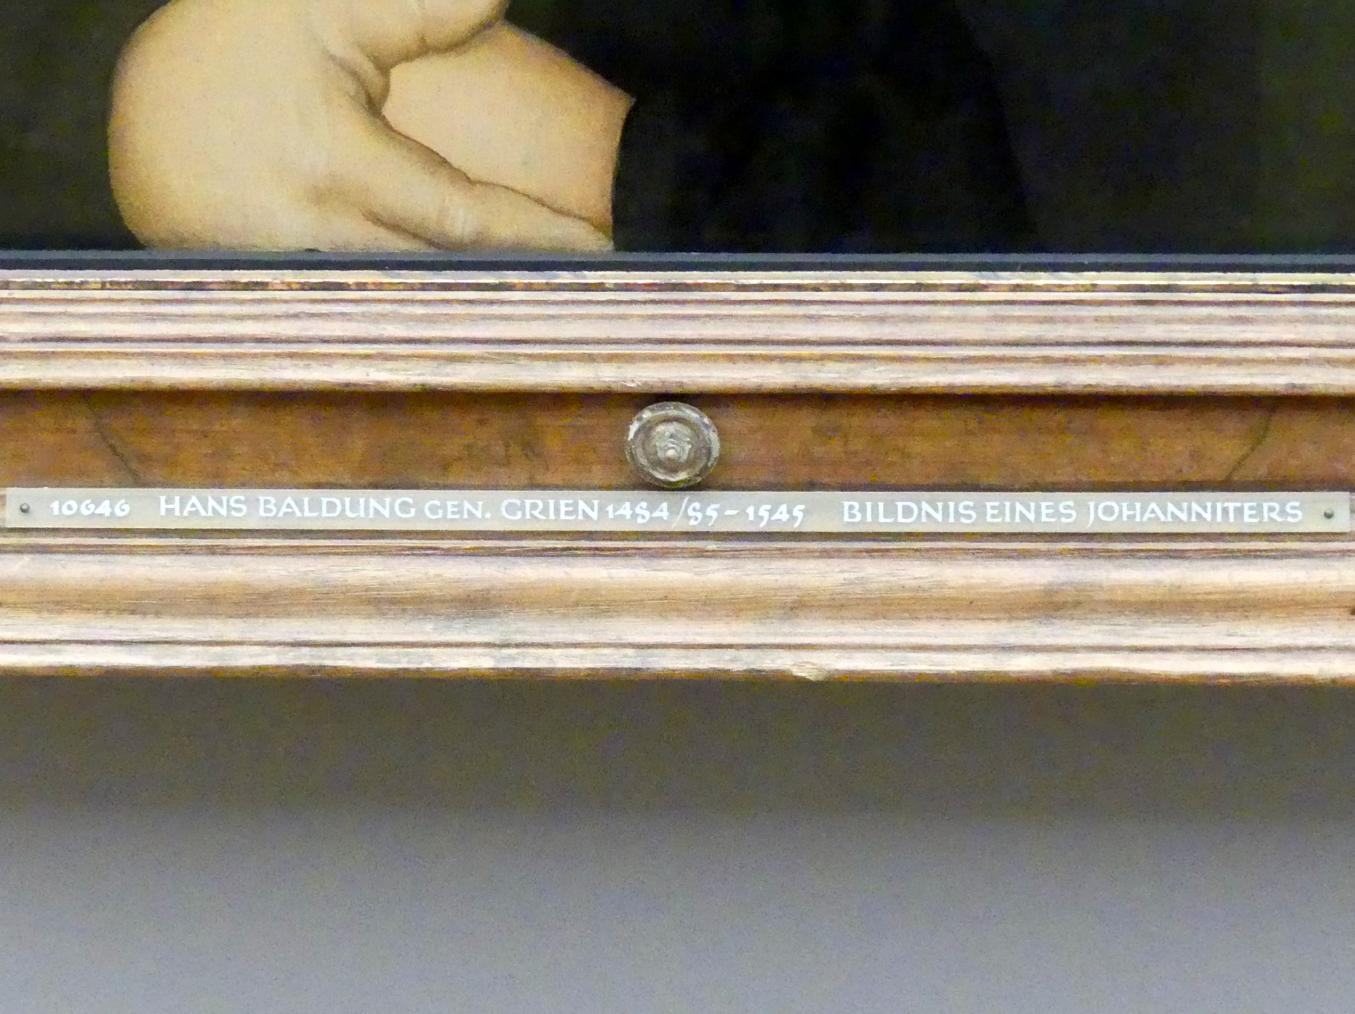 Hans Baldung Grien: Bildnis des Straßburger Johanniterkomturs Balthasar Gerhardi, 1528, Bild 2/2